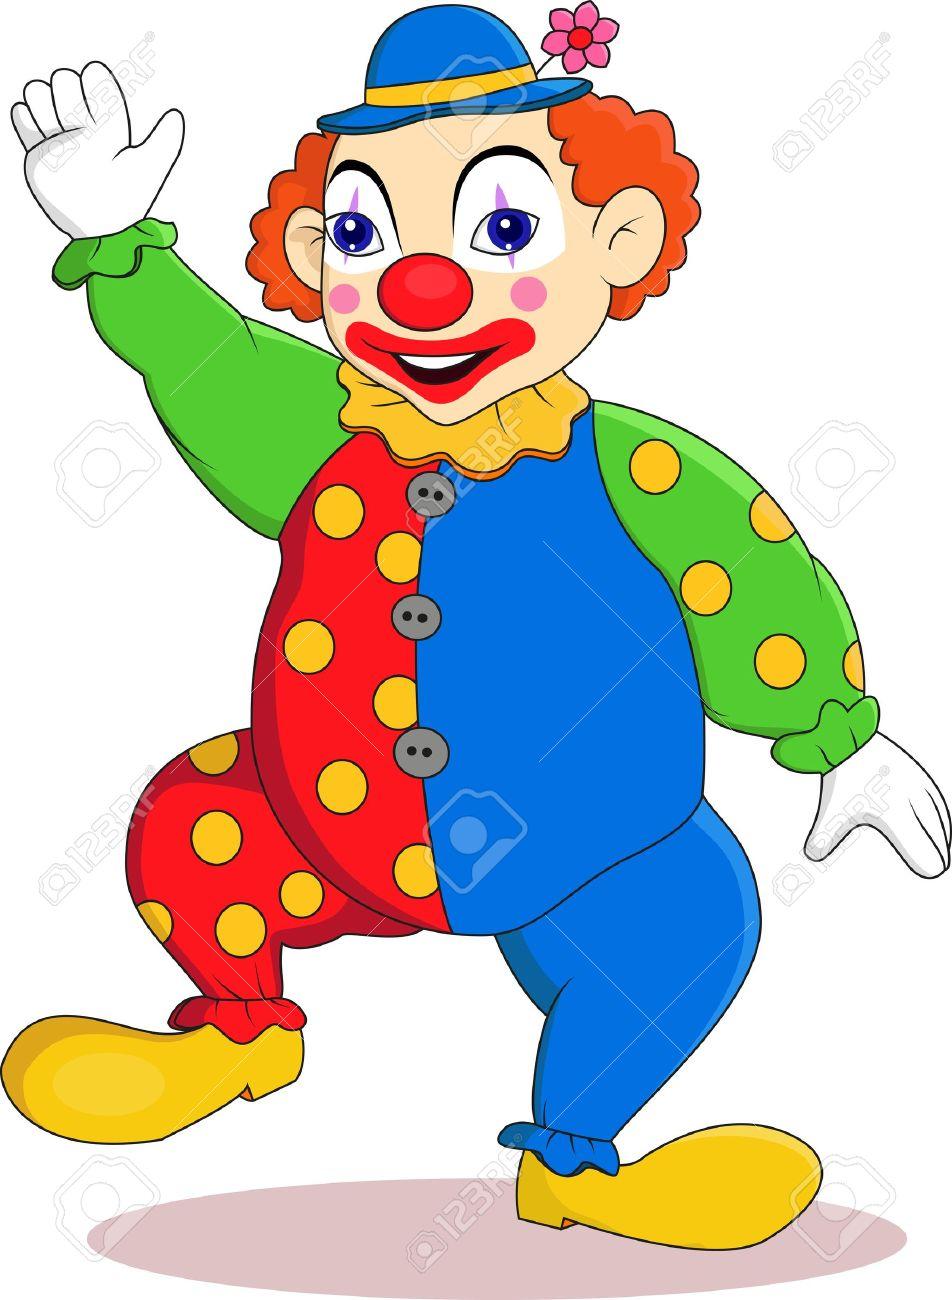 Funny clown cartoon - 14662172